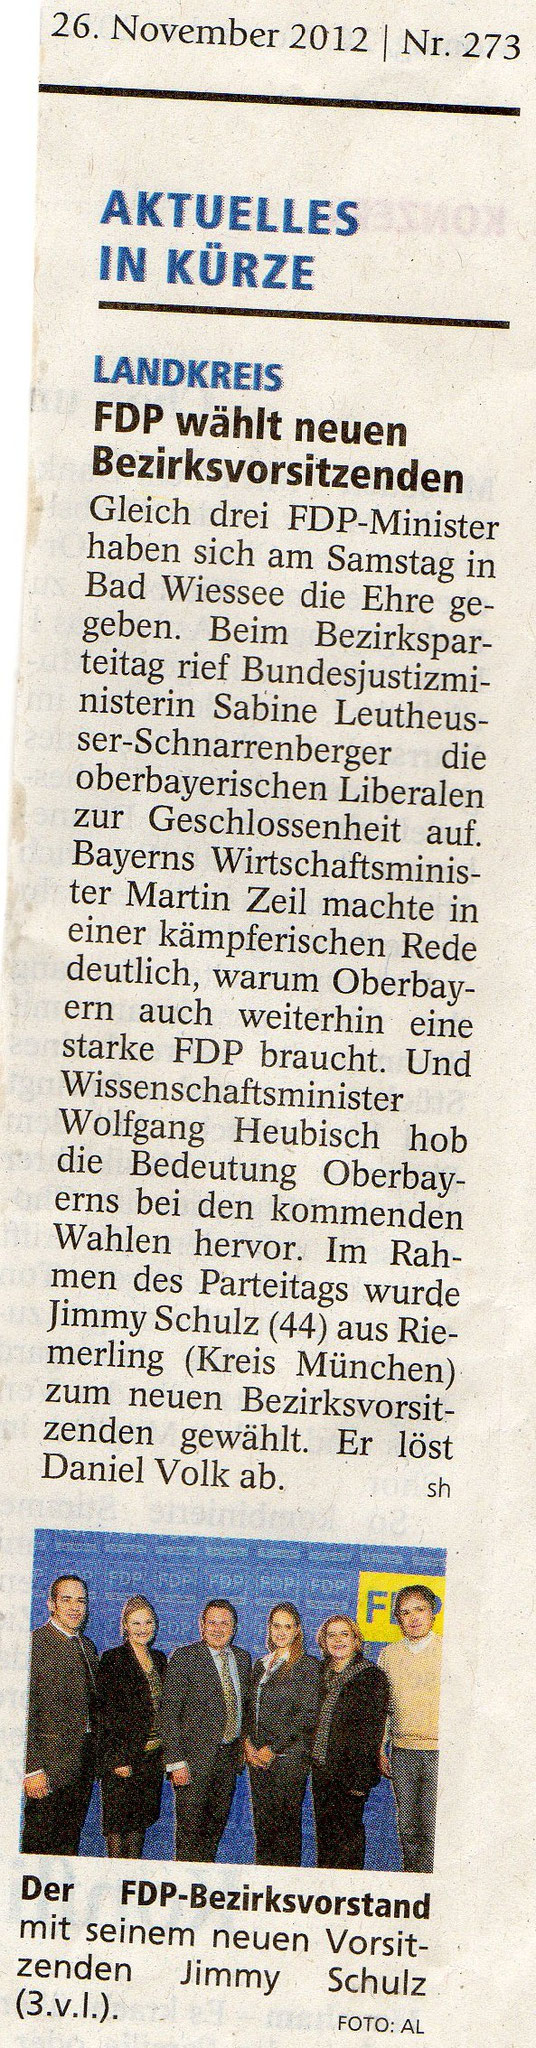 26. November 2012: FDP wählt neuen Bezirksvorsitzenden (.jpg)